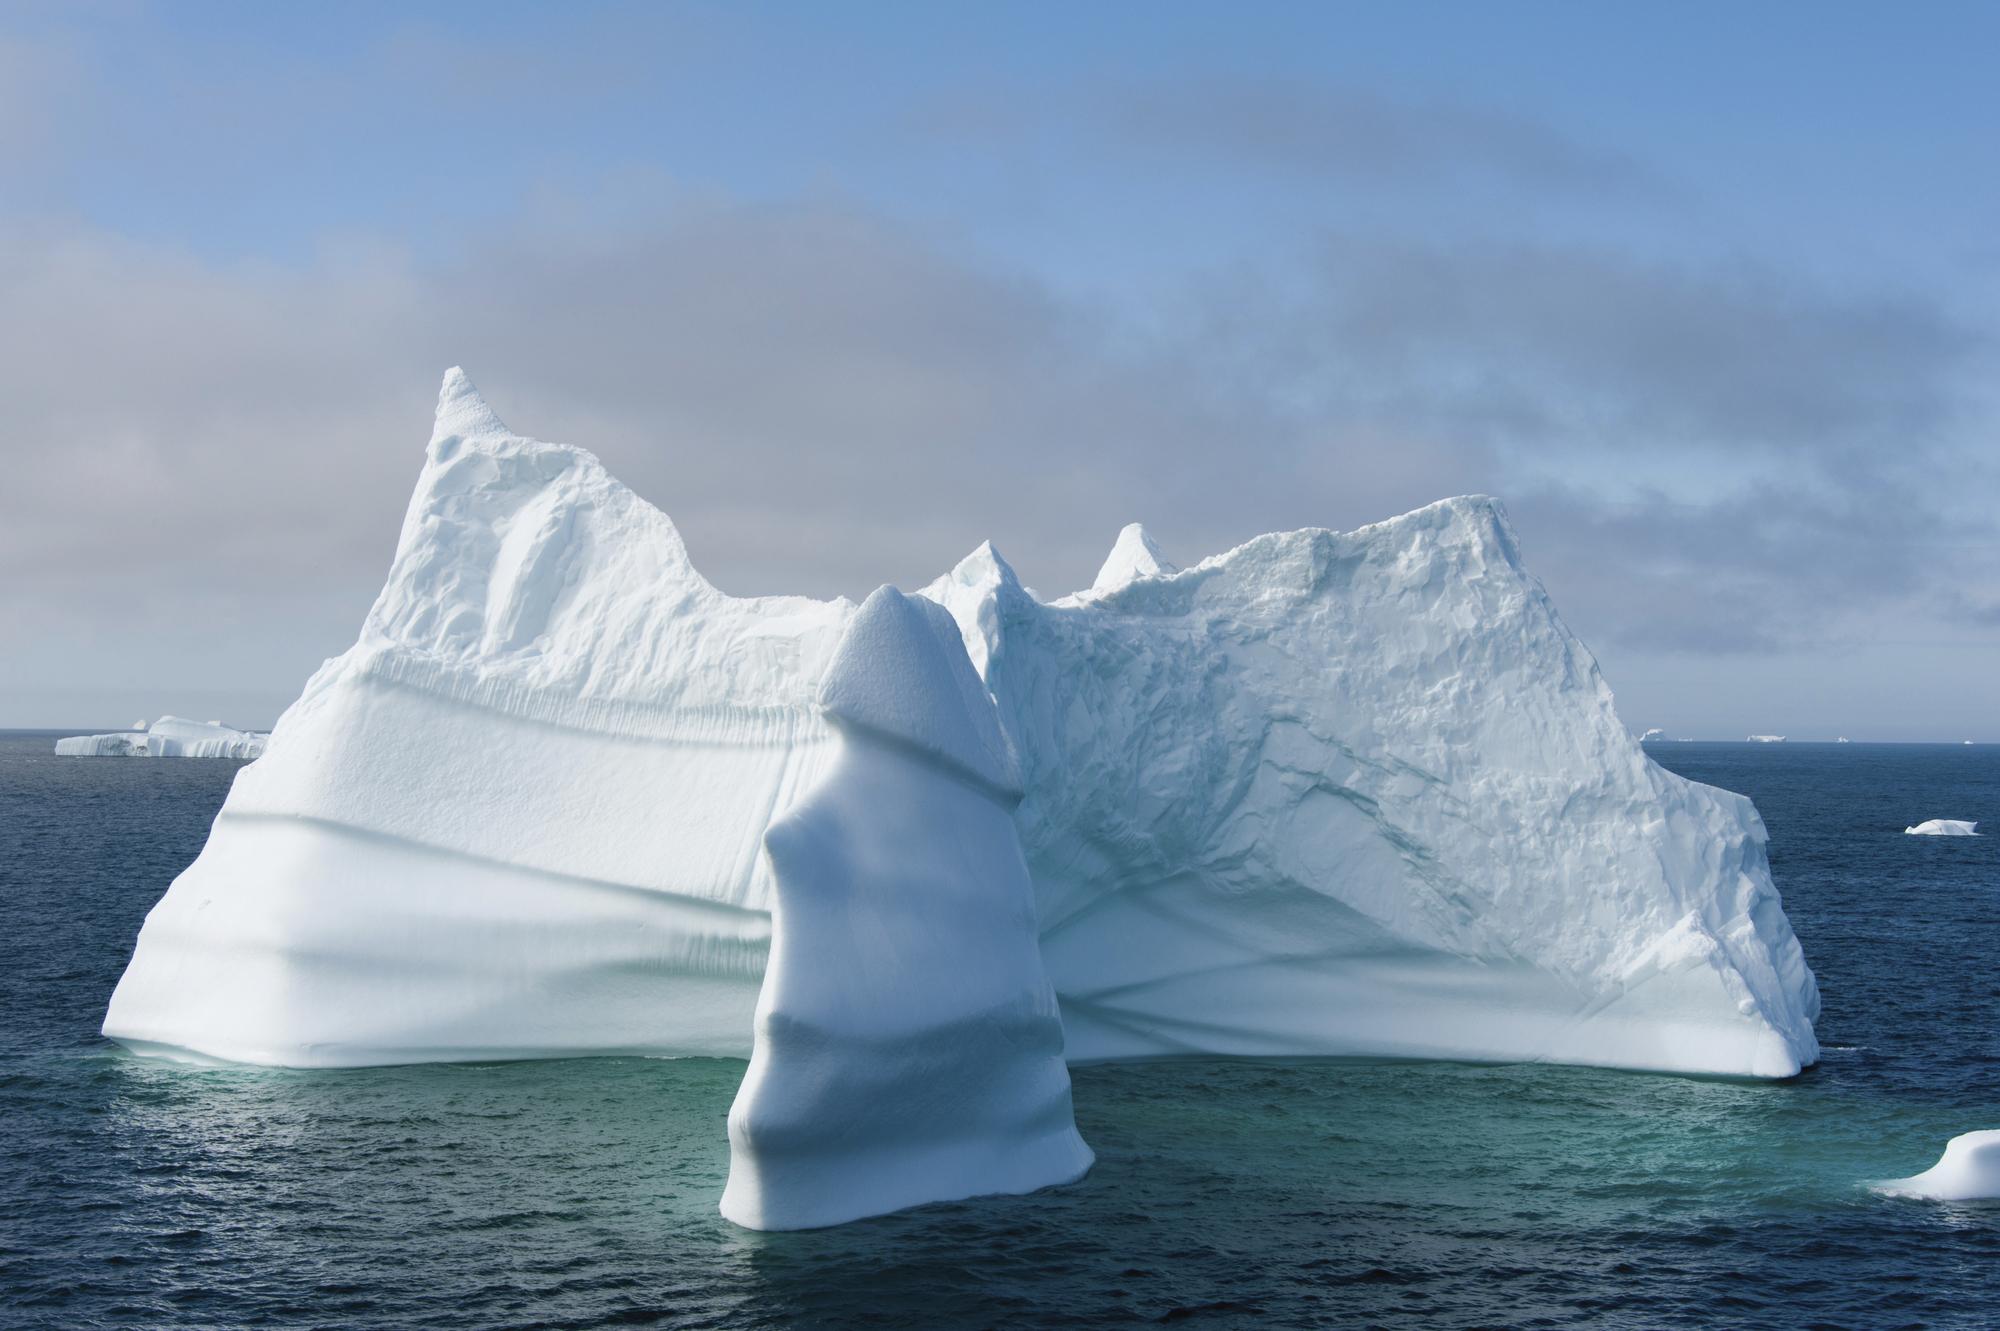 MS OCEAN ATLANTIC: DISKOBUCHT